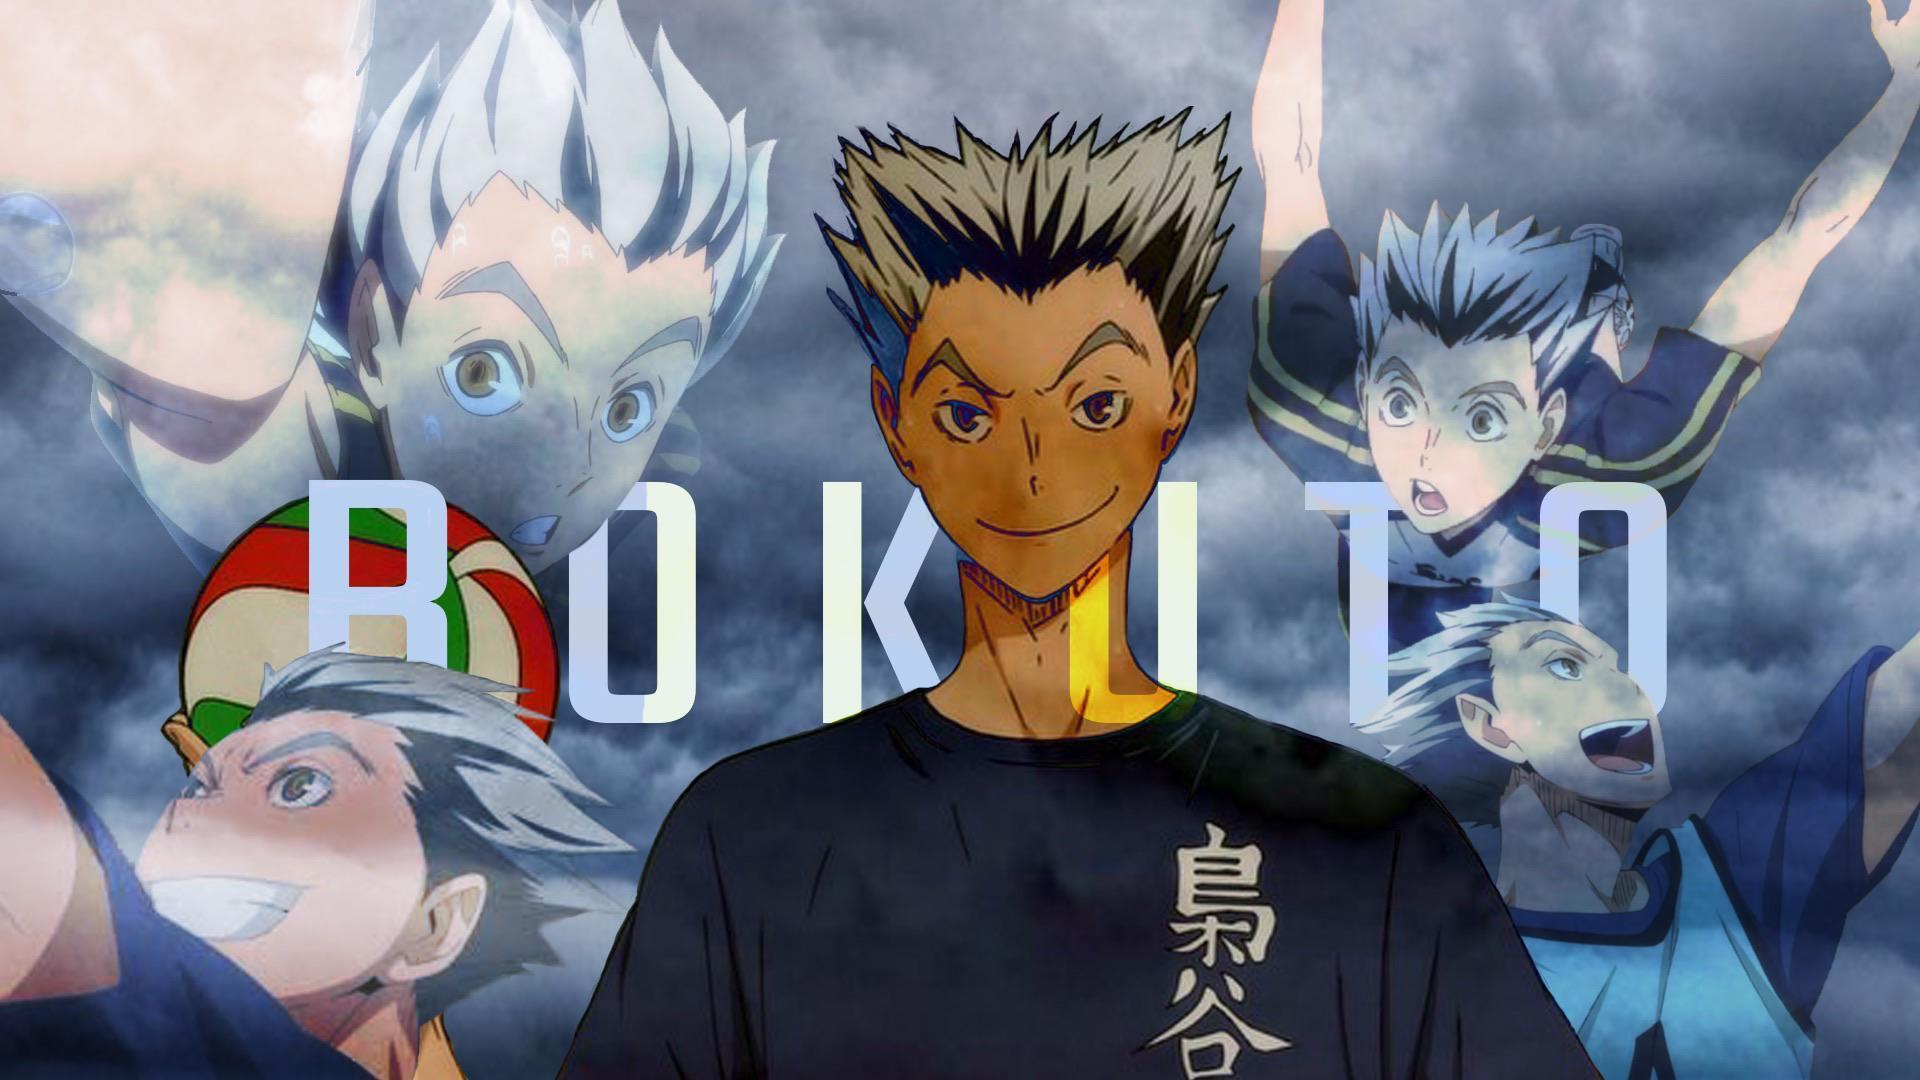 haikyuu bokuto wallpapers top free